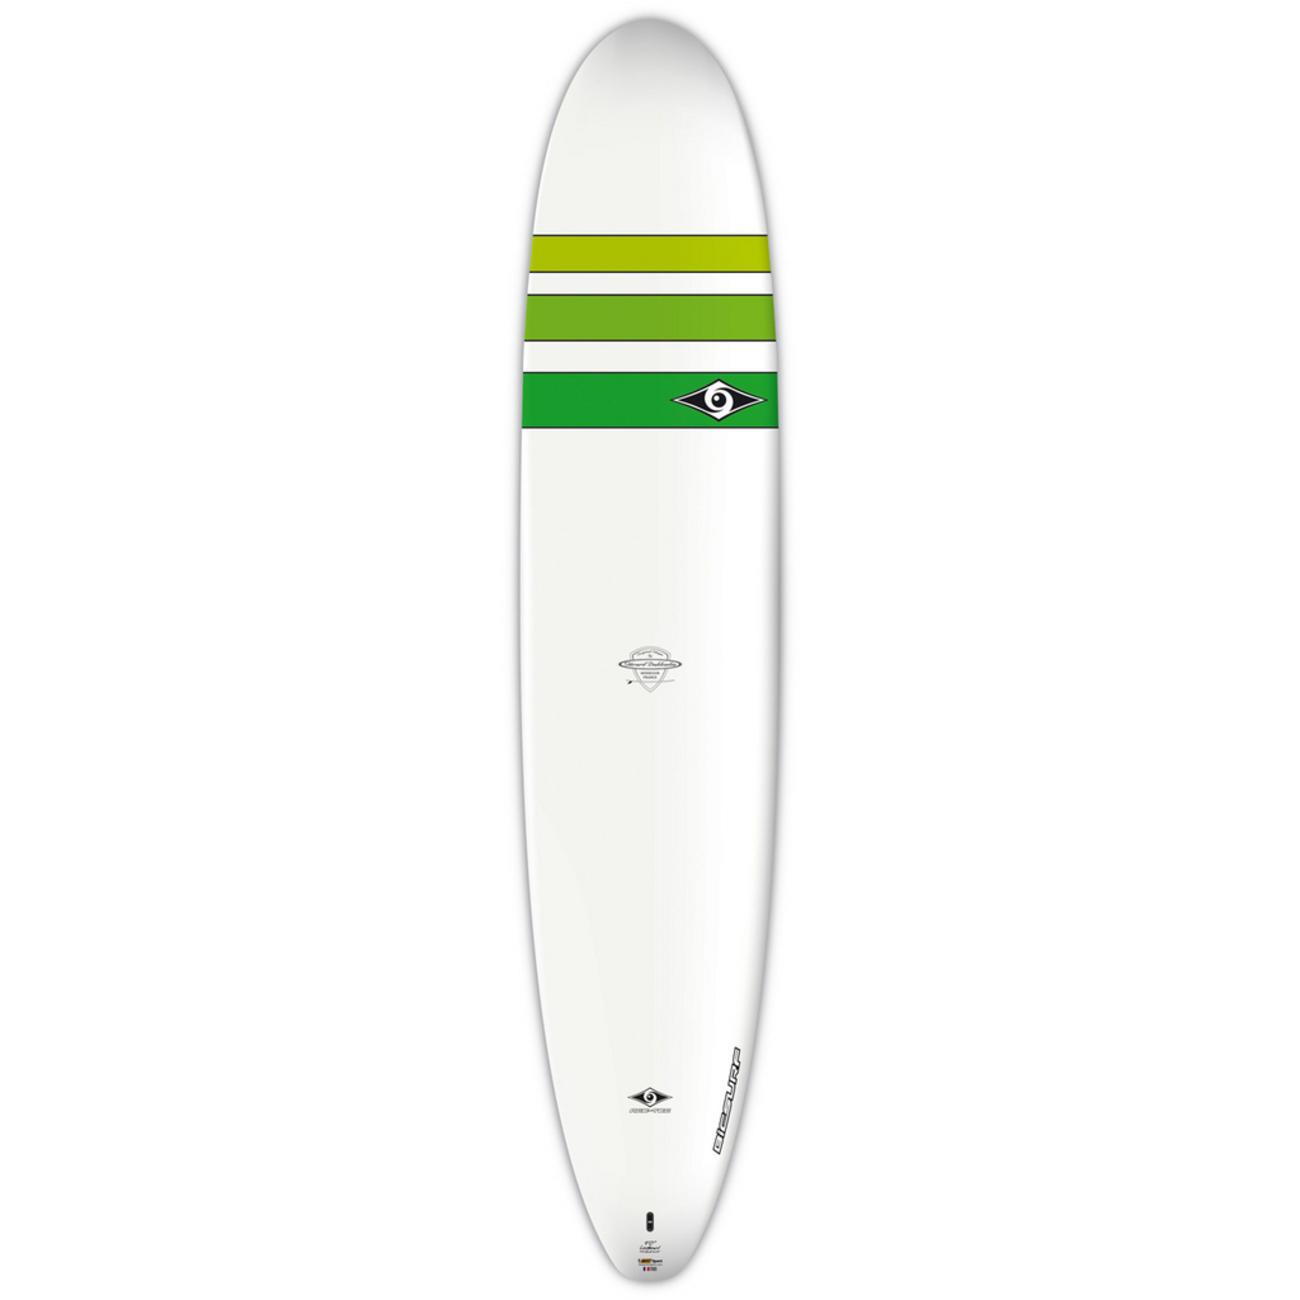 9'0 Classic Longboard